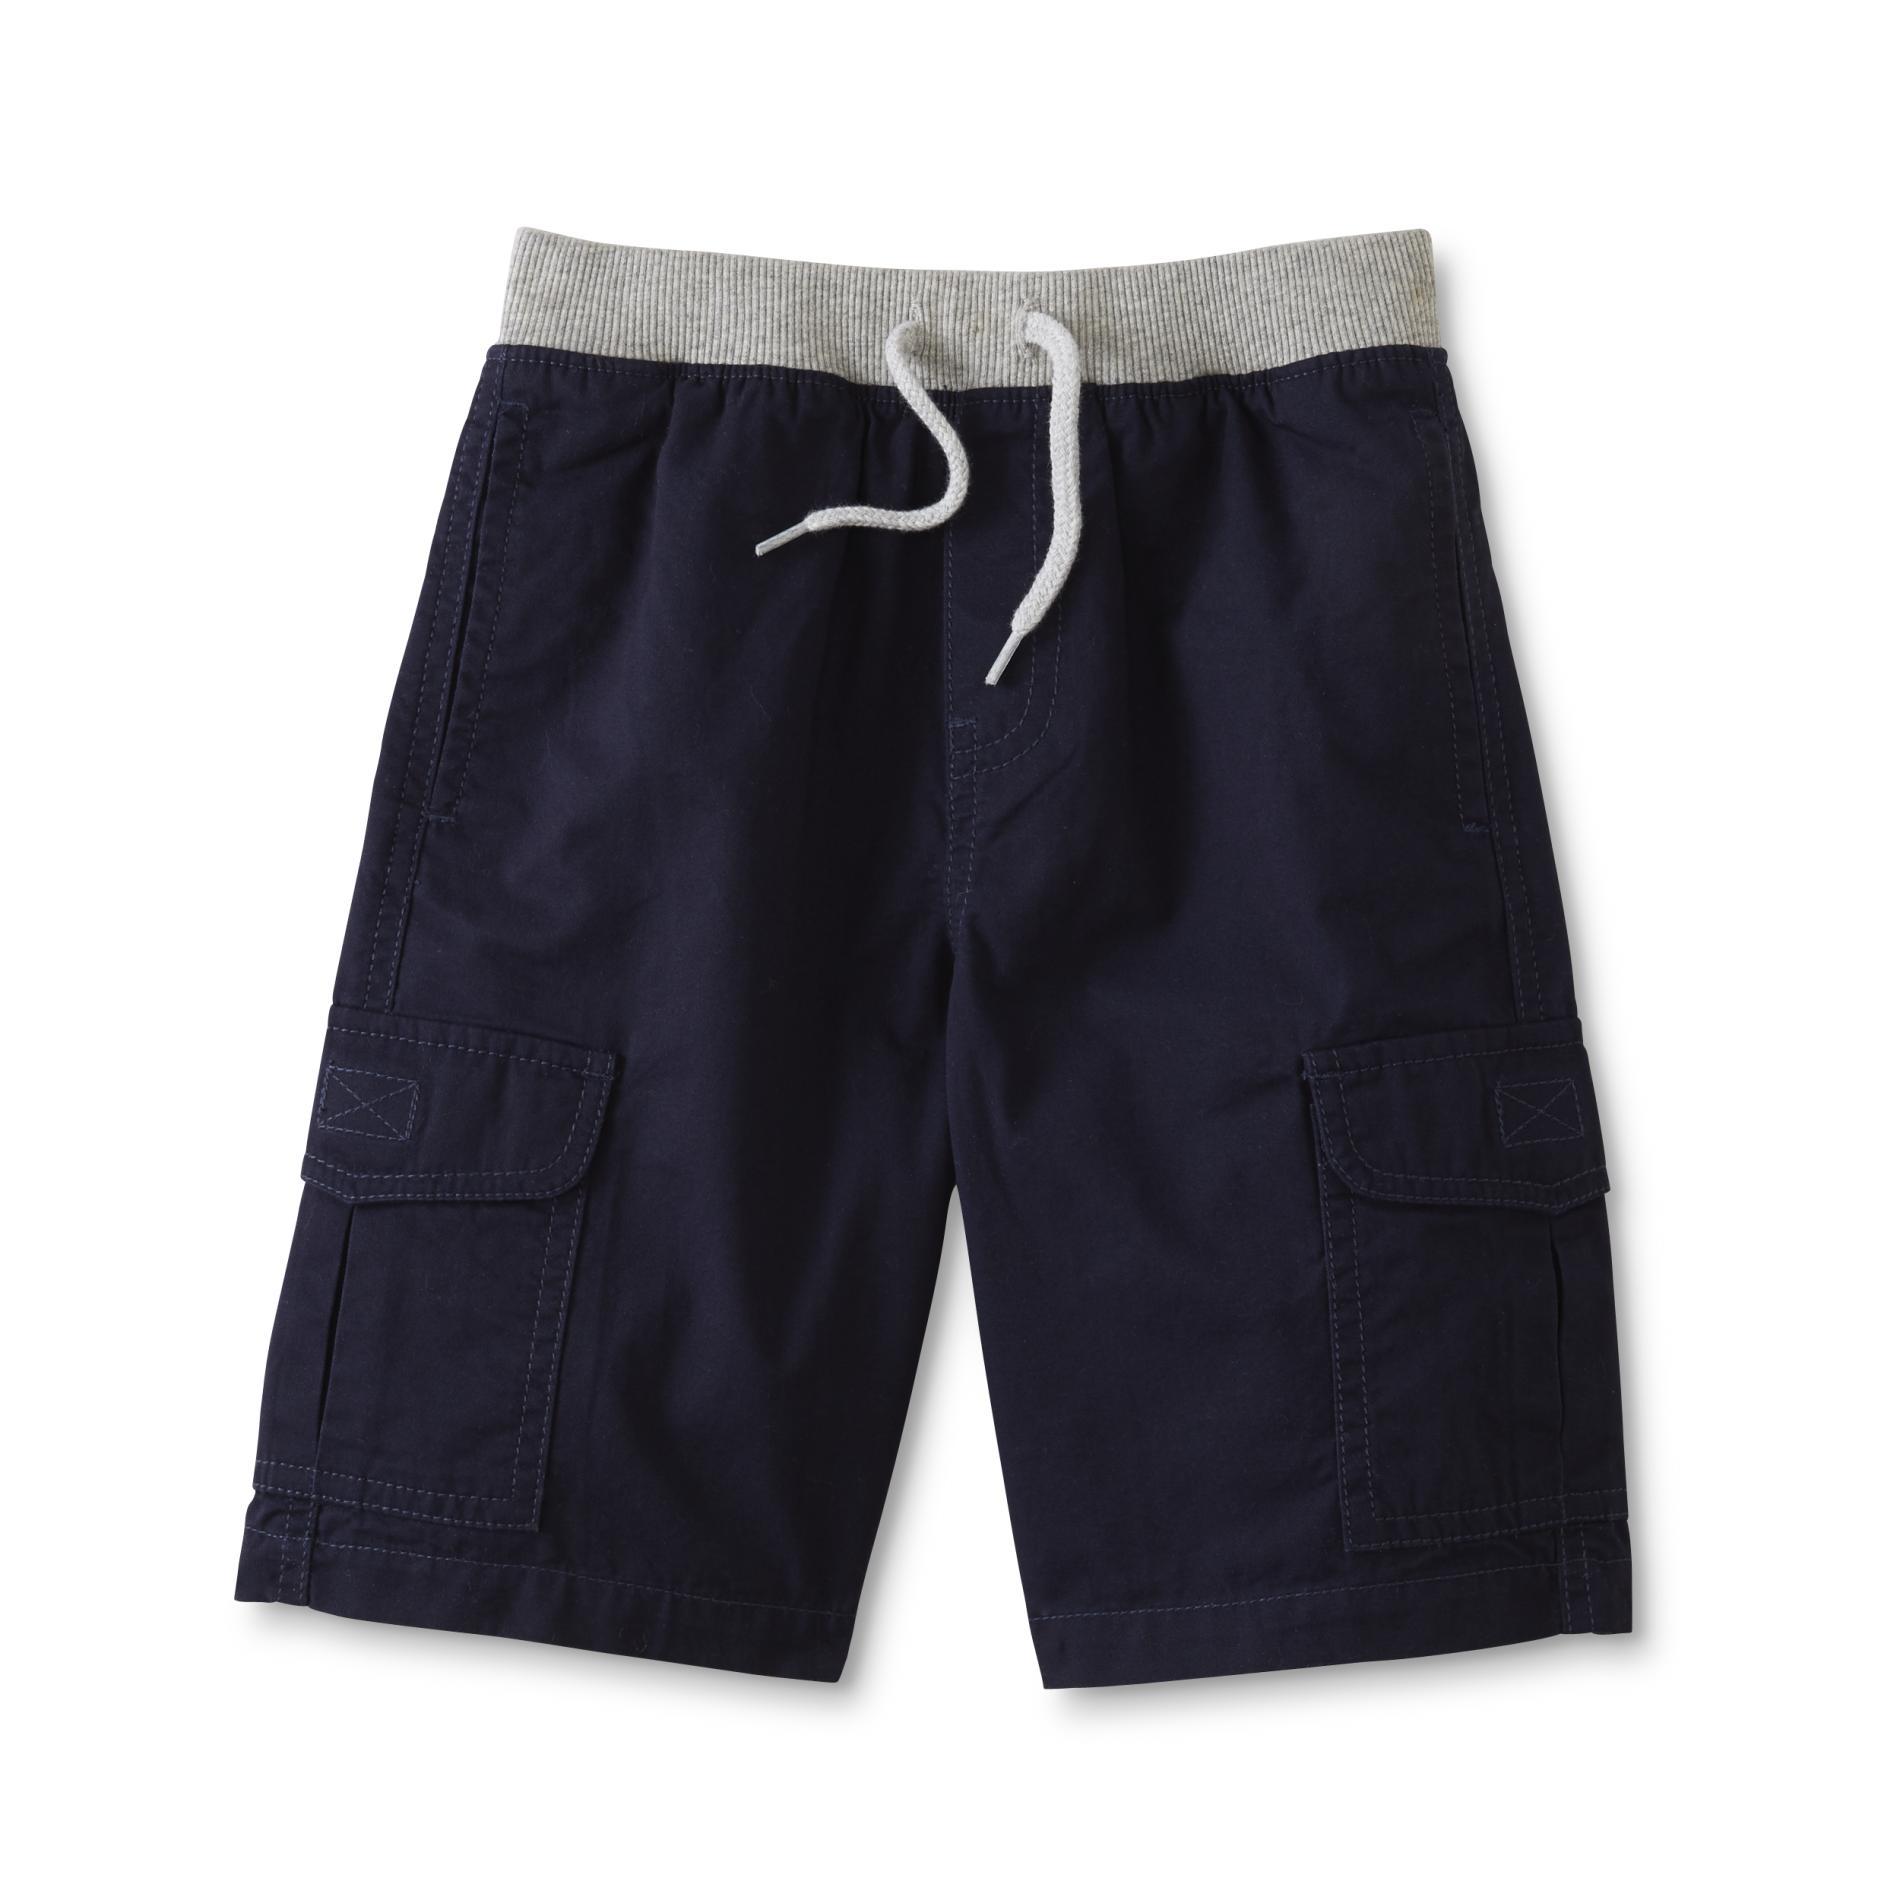 Toughskins Infant Amp Toddler Boys Cargo Shorts